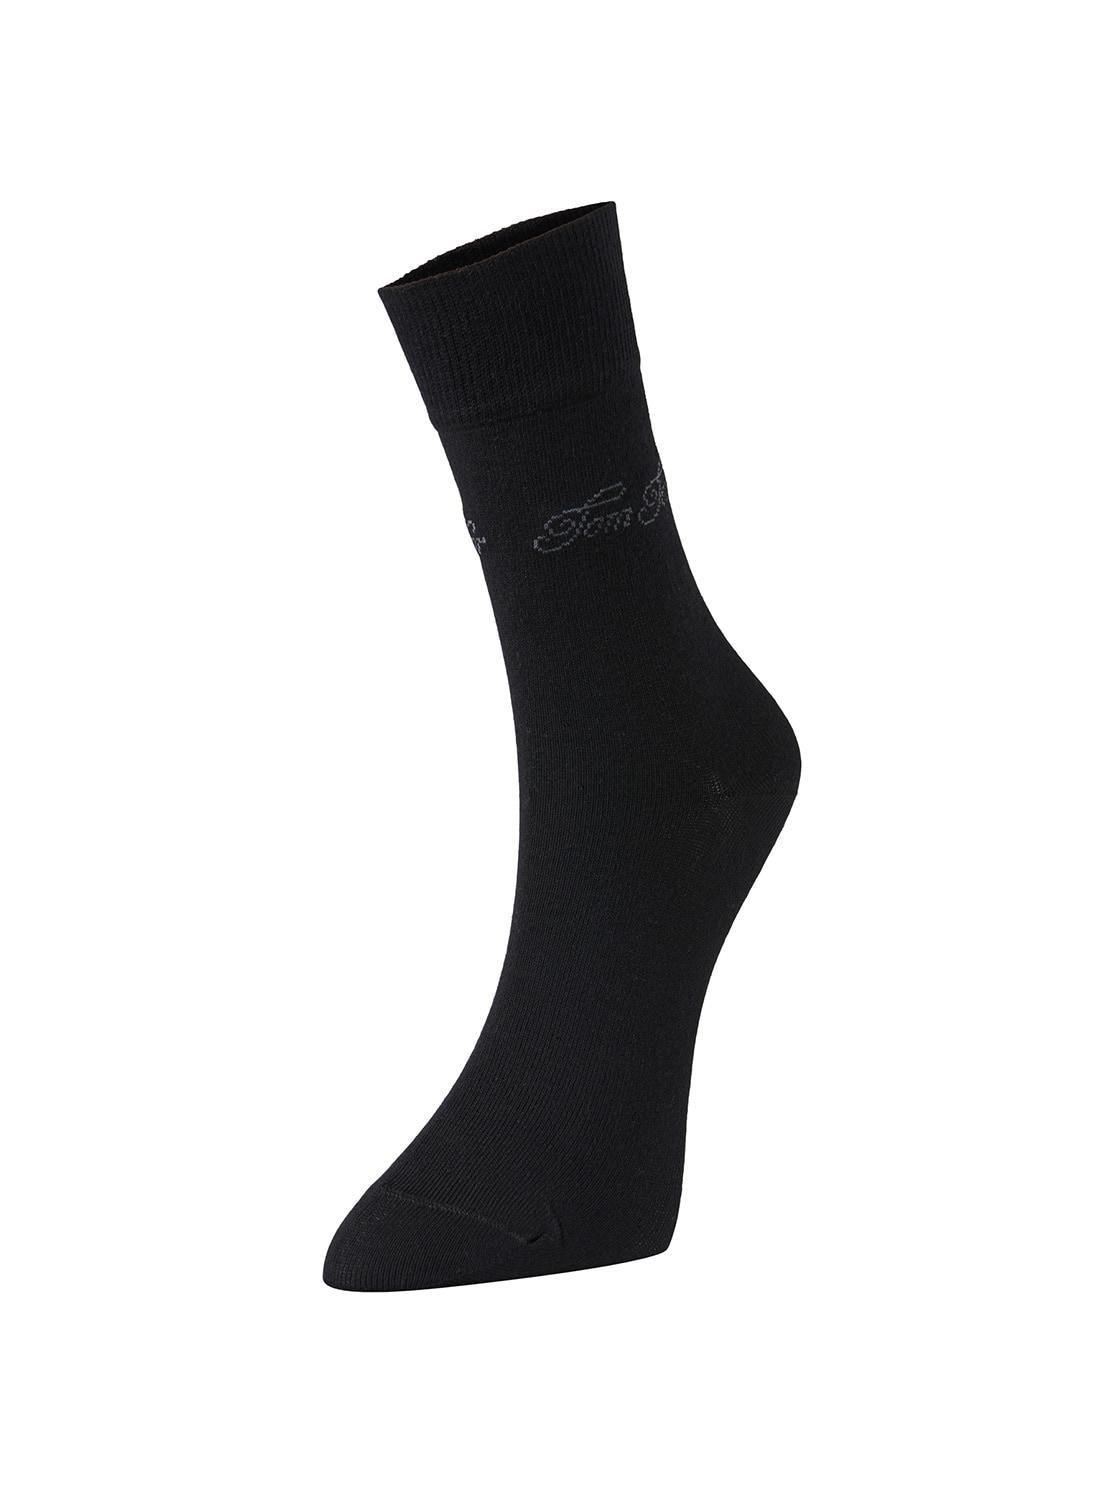 TOM TAILOR Socken im Doppelpack, Damen, black, Größe: 35 38